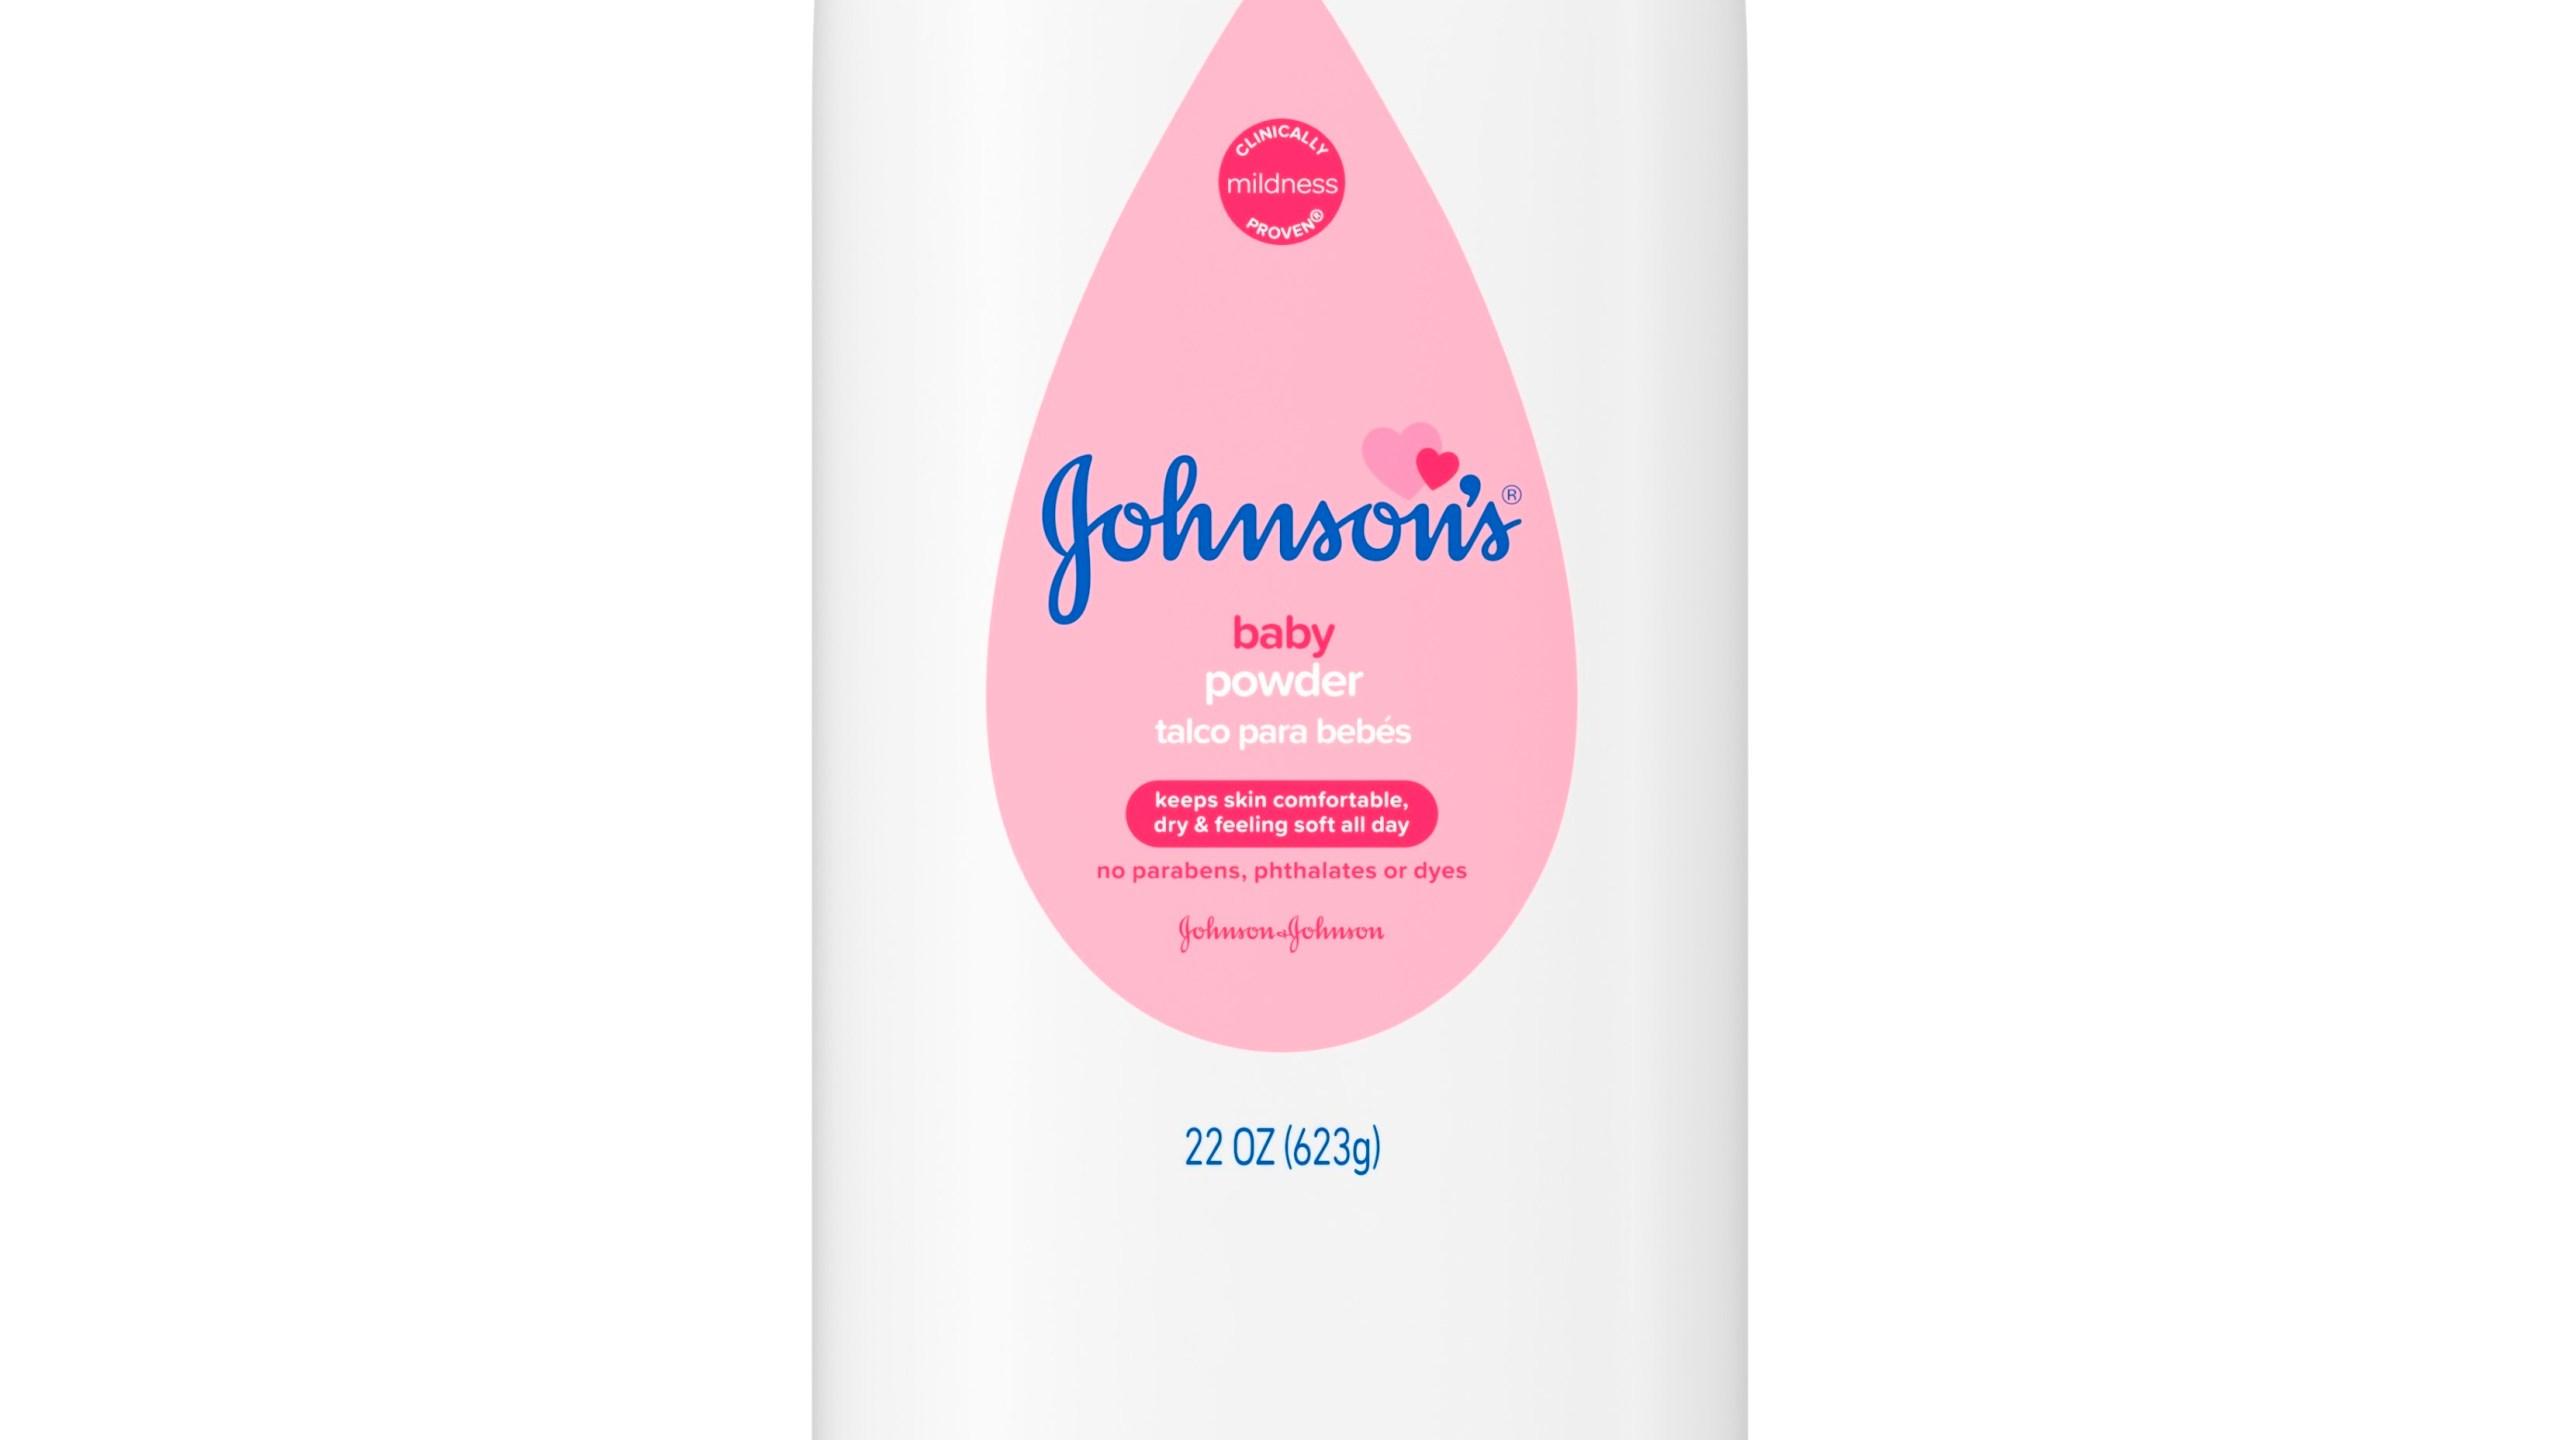 AP19291674377268 - Baby powder recalled after trace asbestos is found in Johnson & Johnson bottle | KTVE